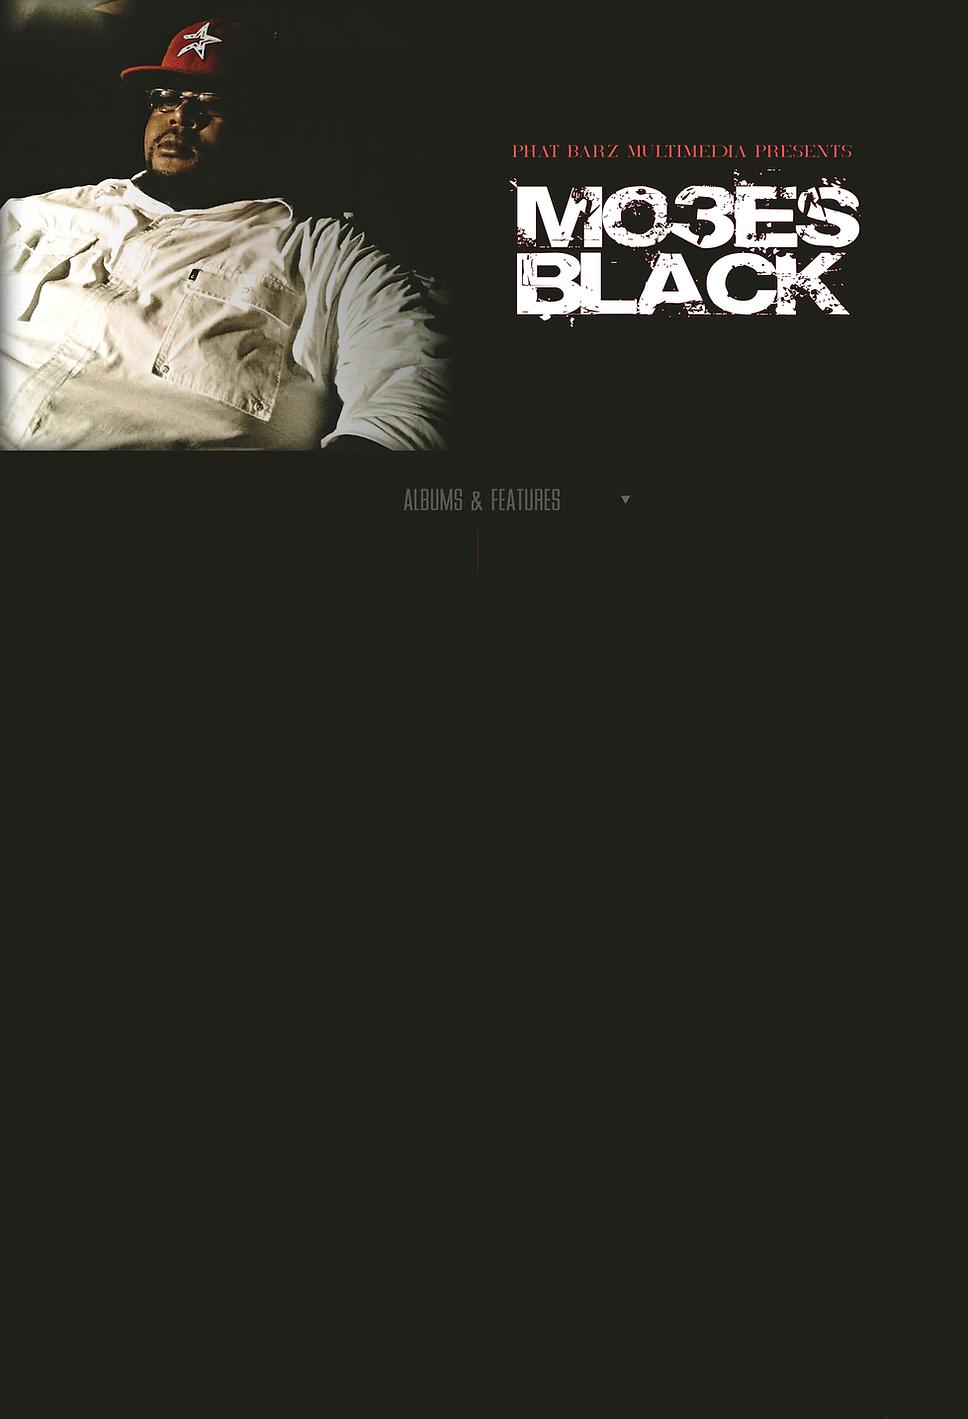 Mo3es Black Webpage_Saleday.png